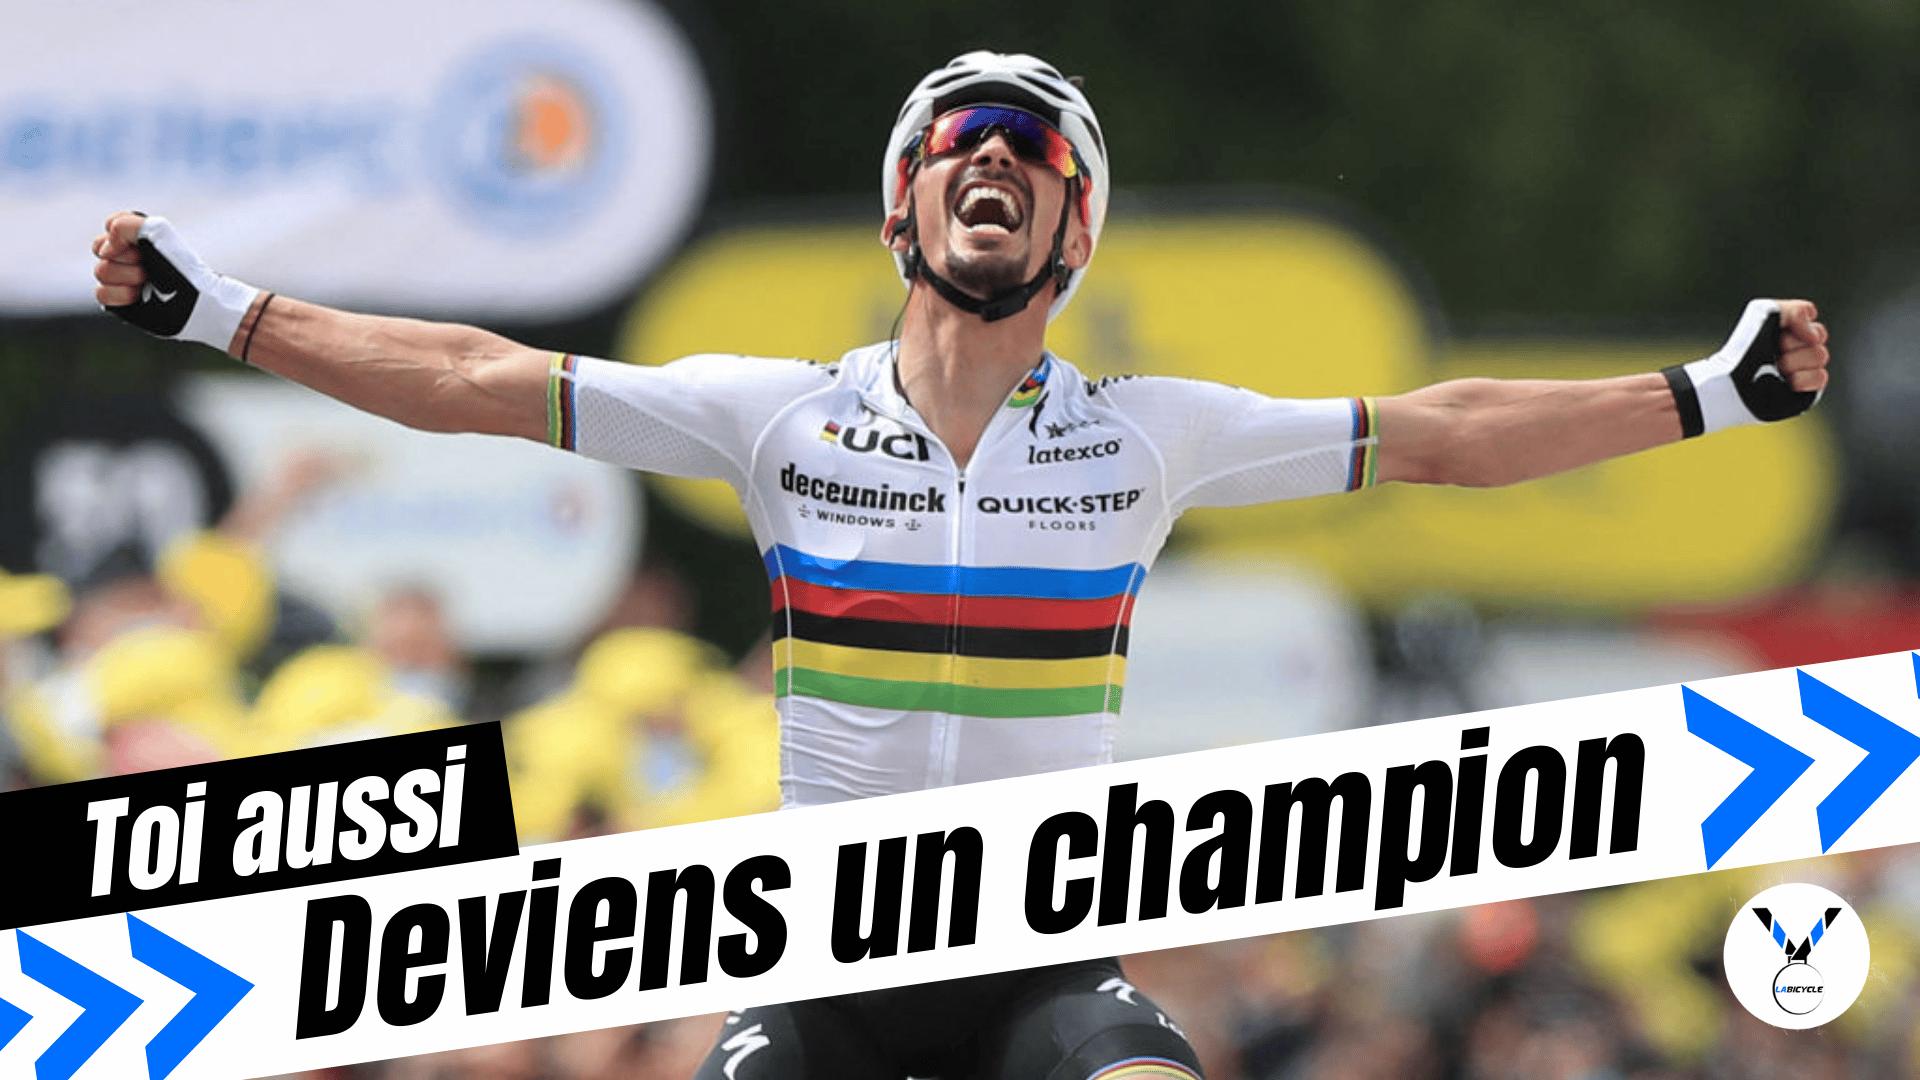 Devenir un champion en cyclisme : nos astuces